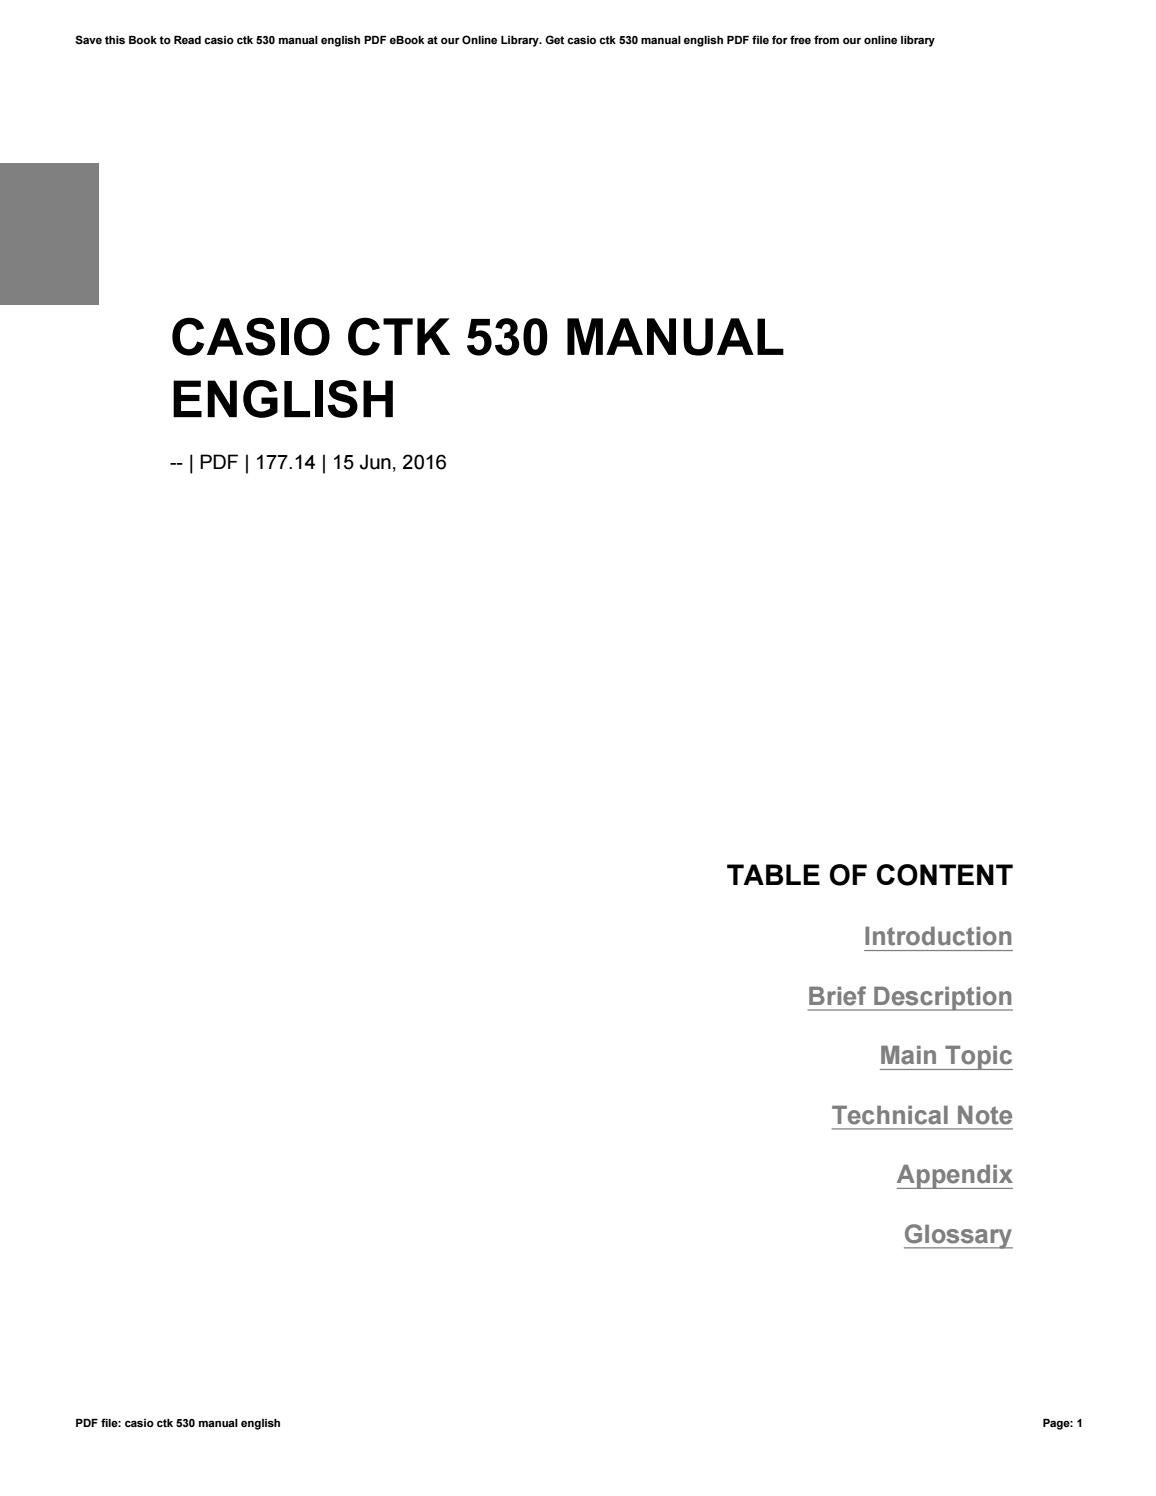 Casio ctk-530 castellano user manual user manual.